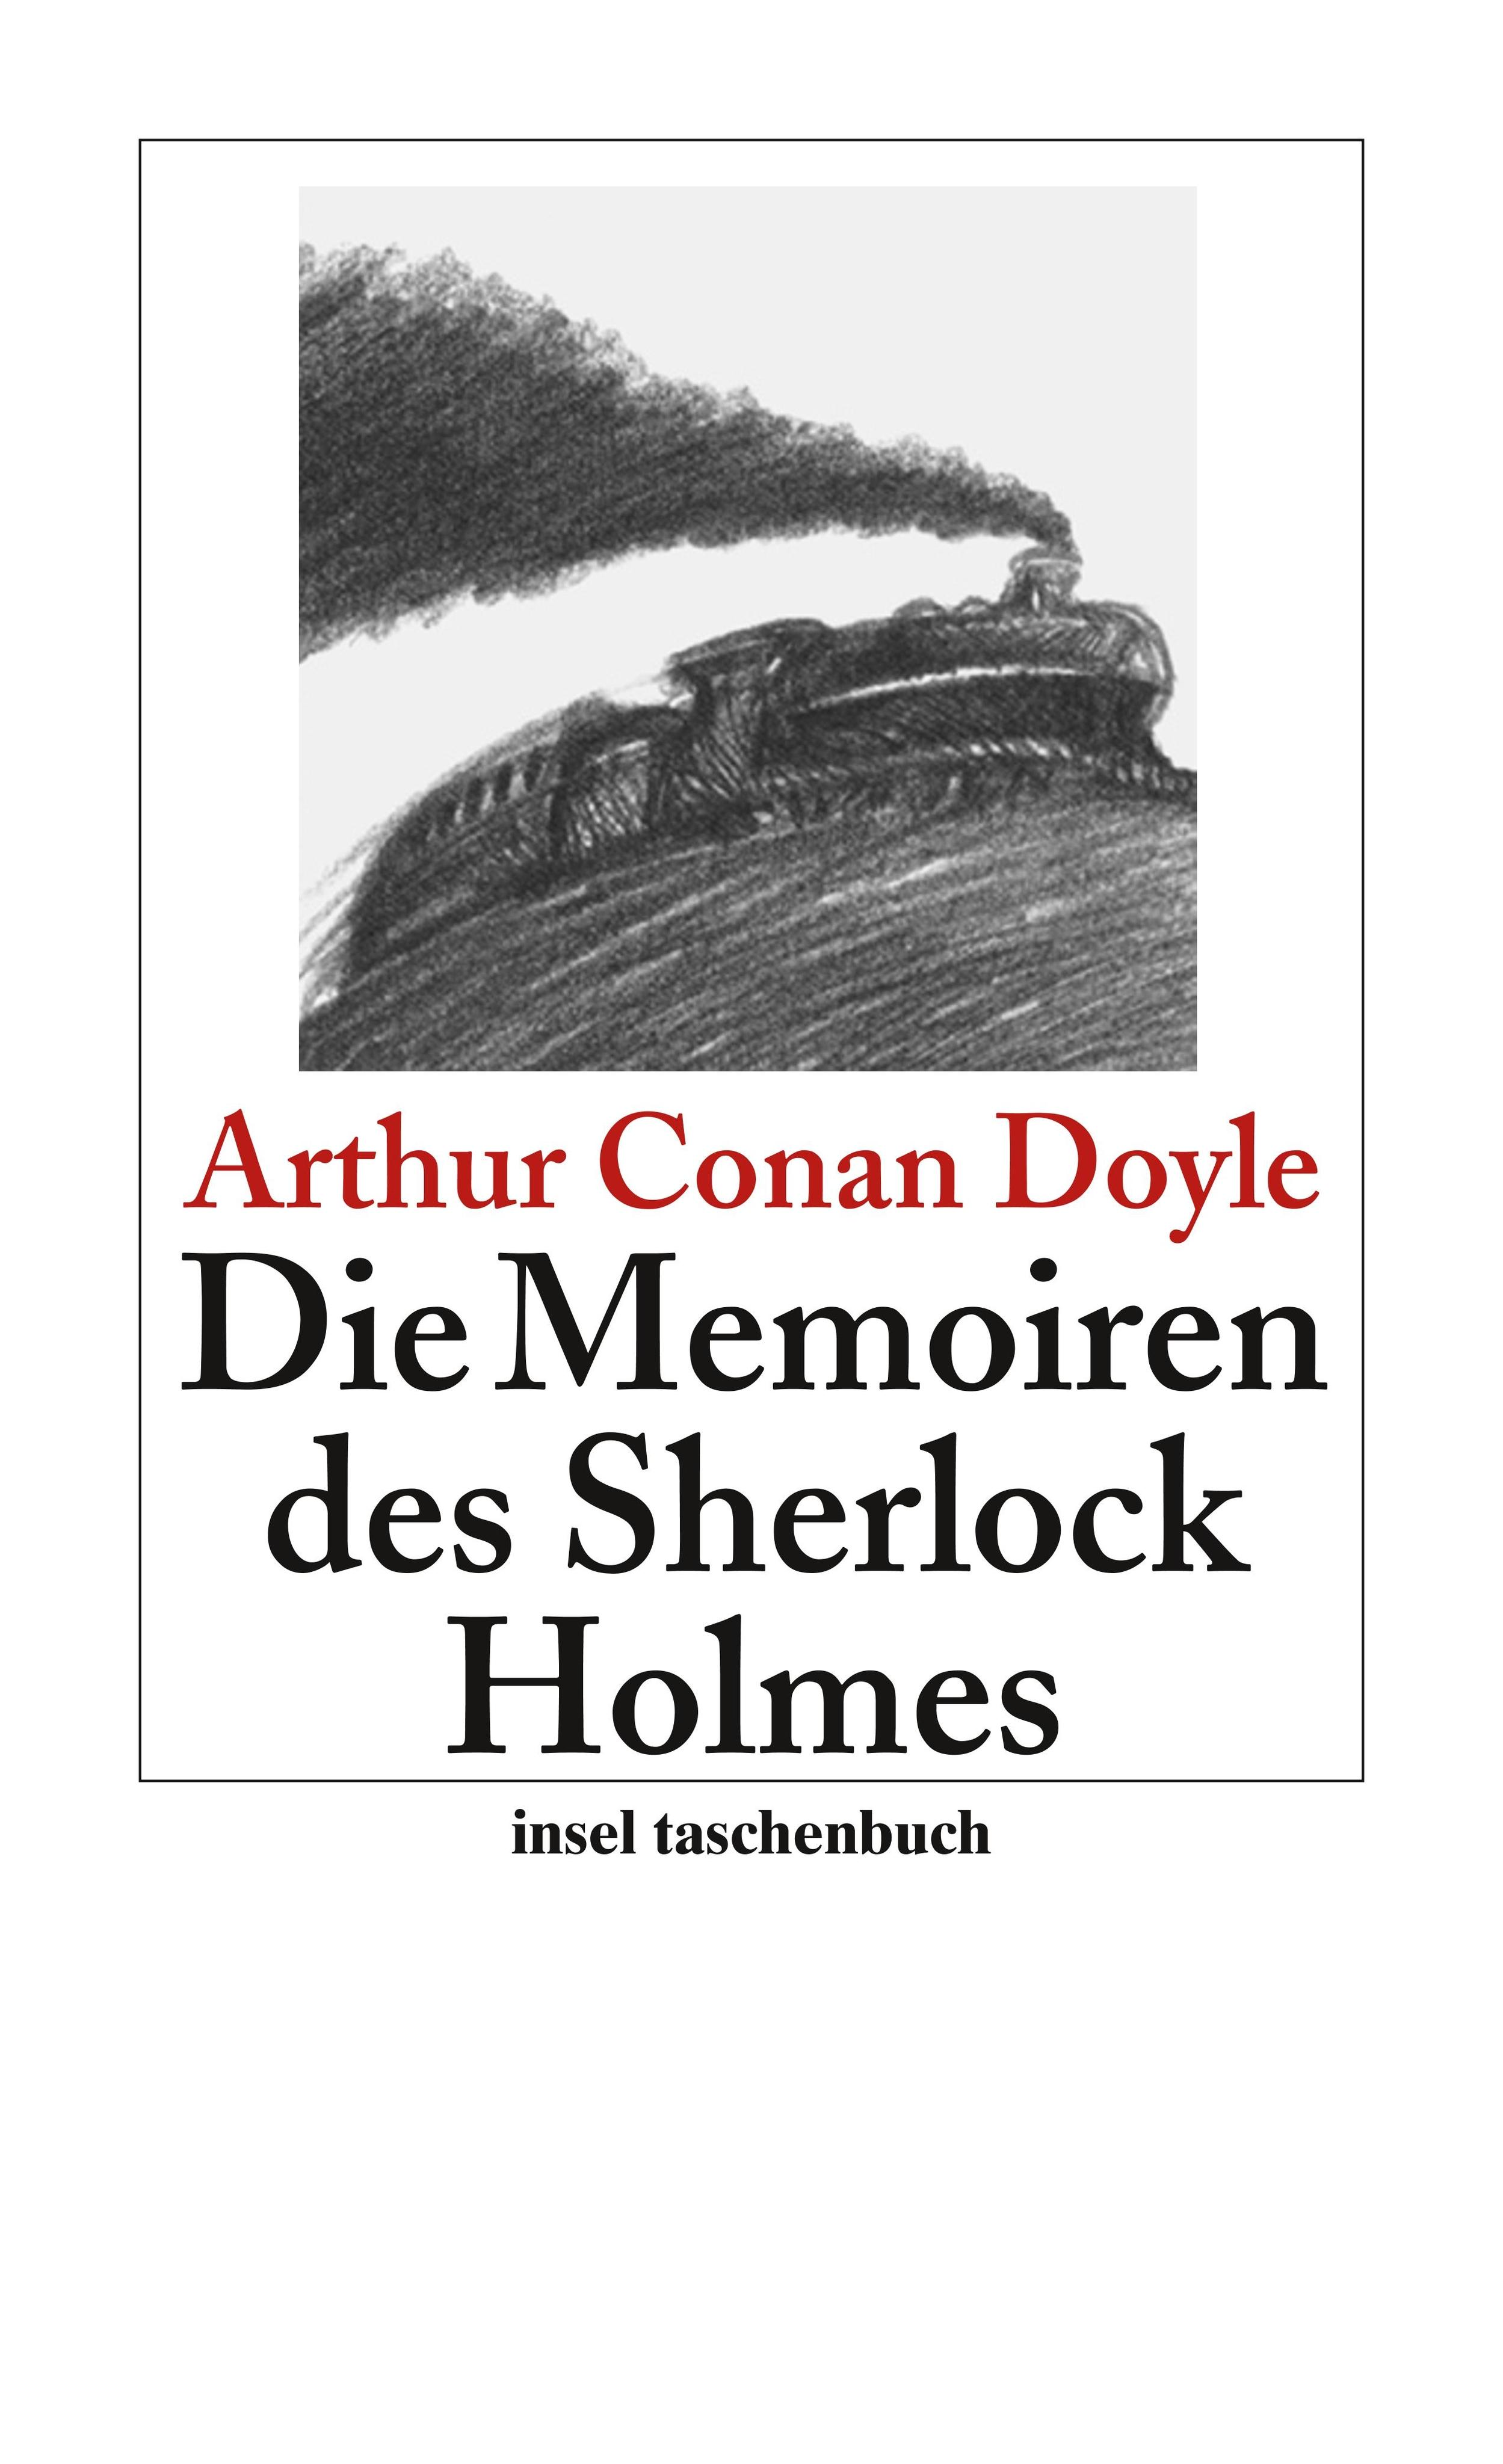 Die Memoiren des Sherlock Holmes Arthur Conan Doyle